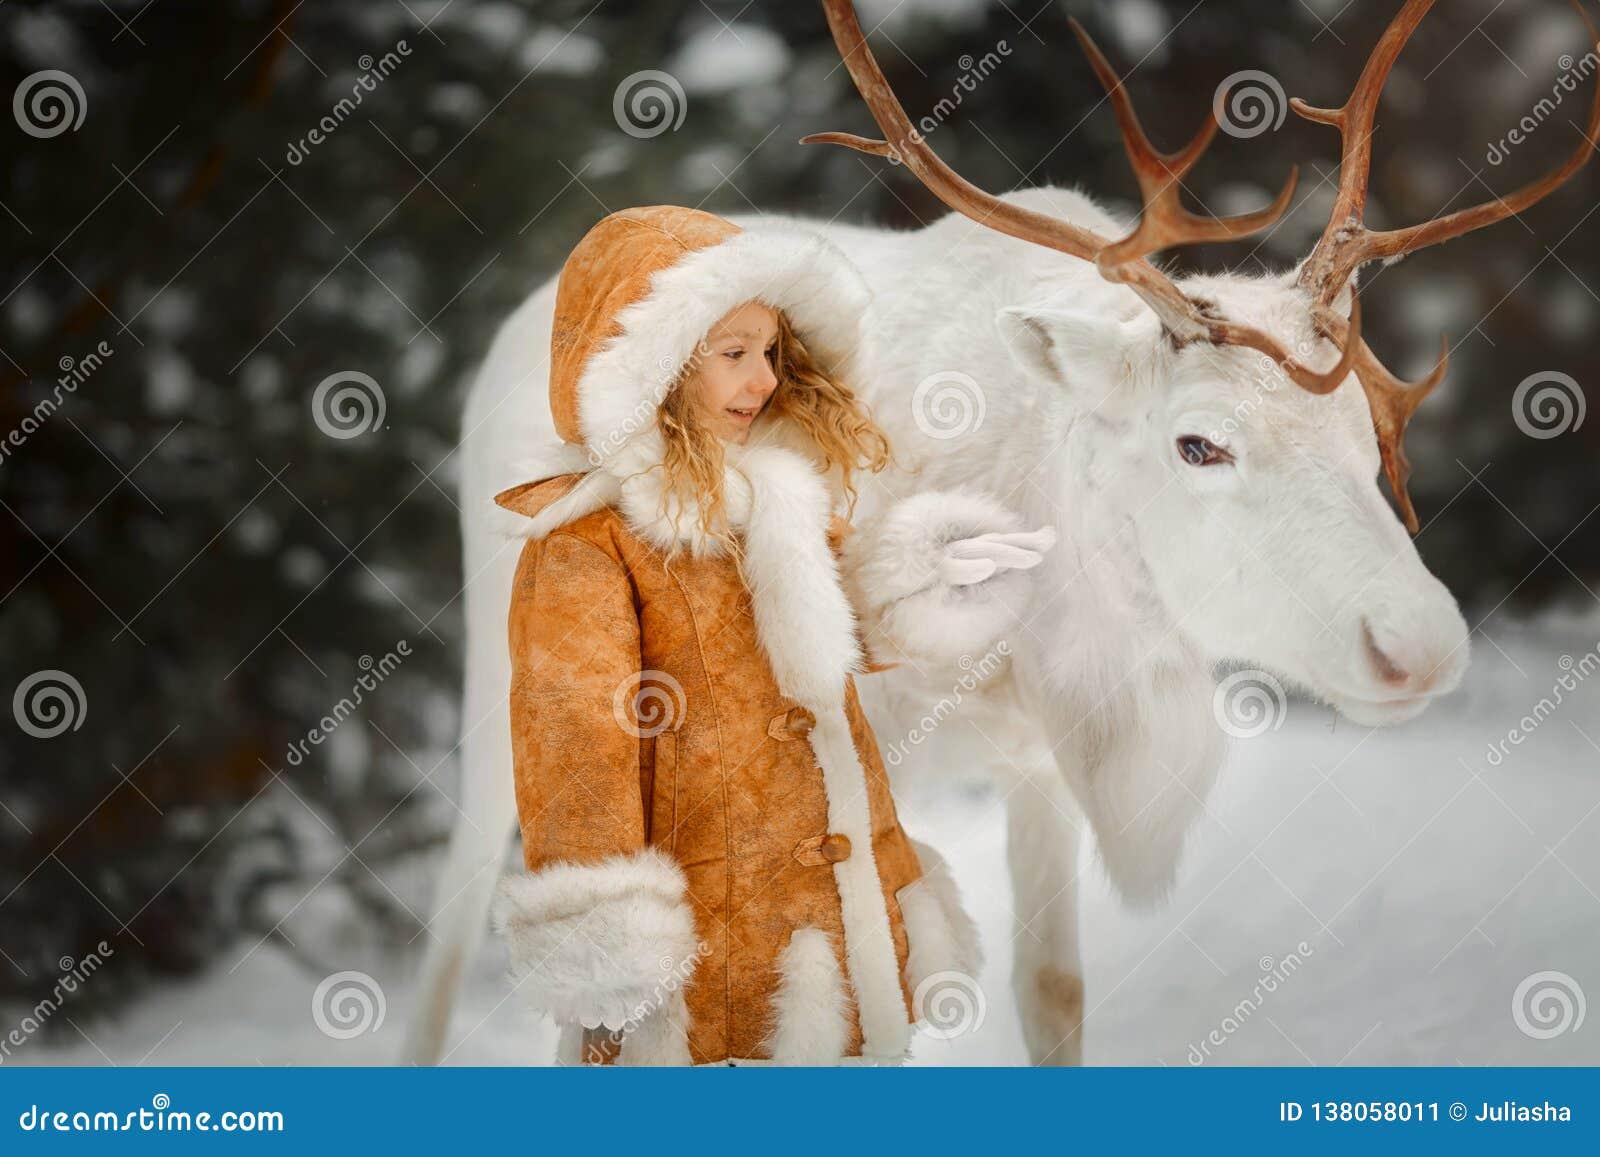 Retrato da menina bonita no casaco de pele na floresta do inverno